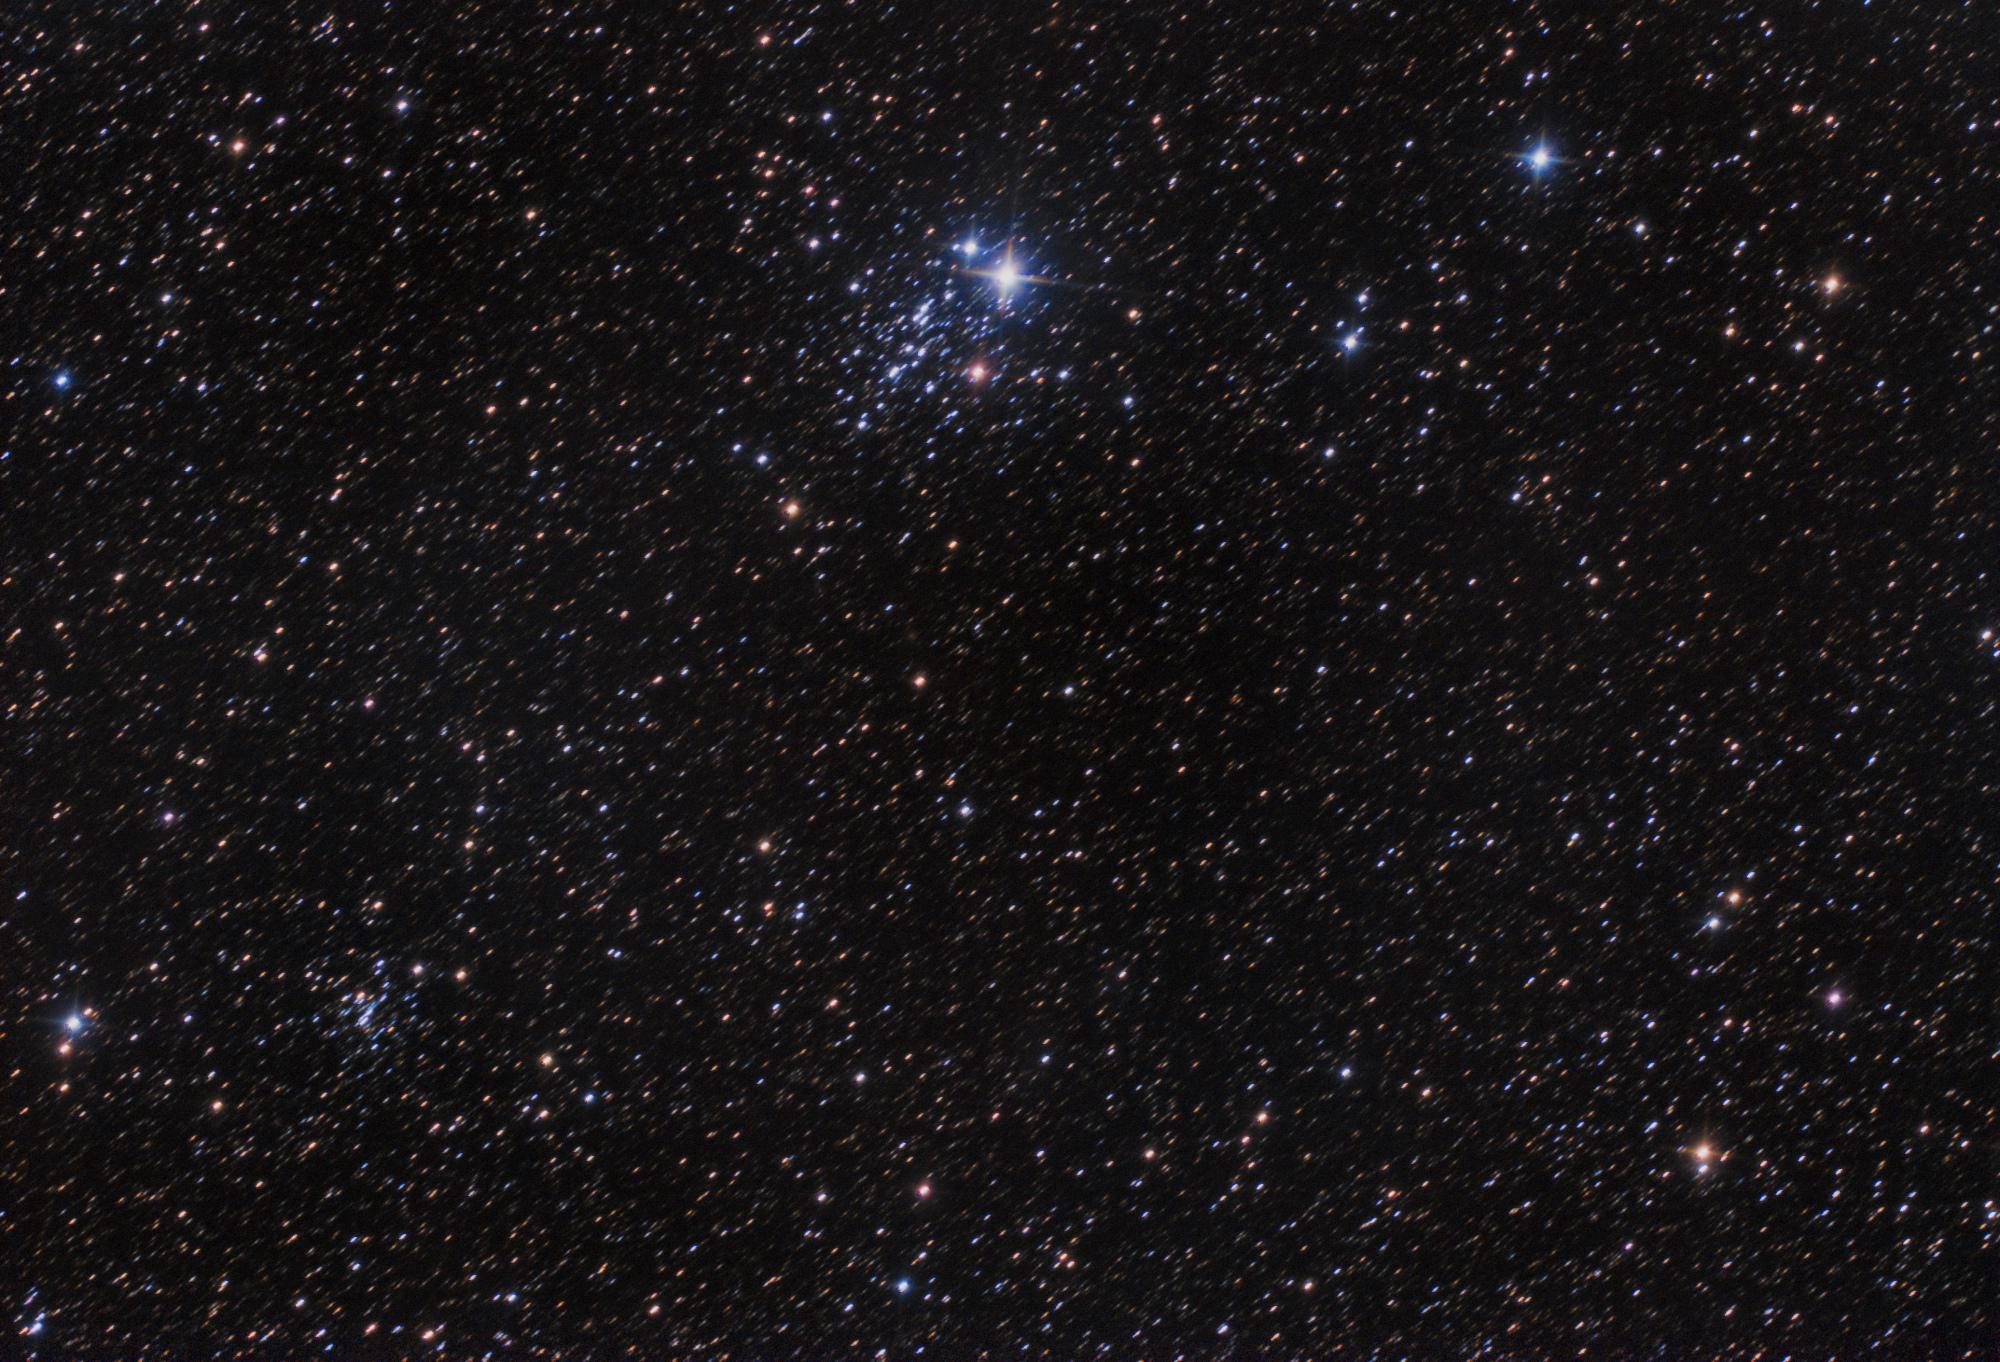 NGC457_RGB-siril-finale-V2.thumb.jpg.786ab8b5a6db9dd1caf75abe354483ff.jpg